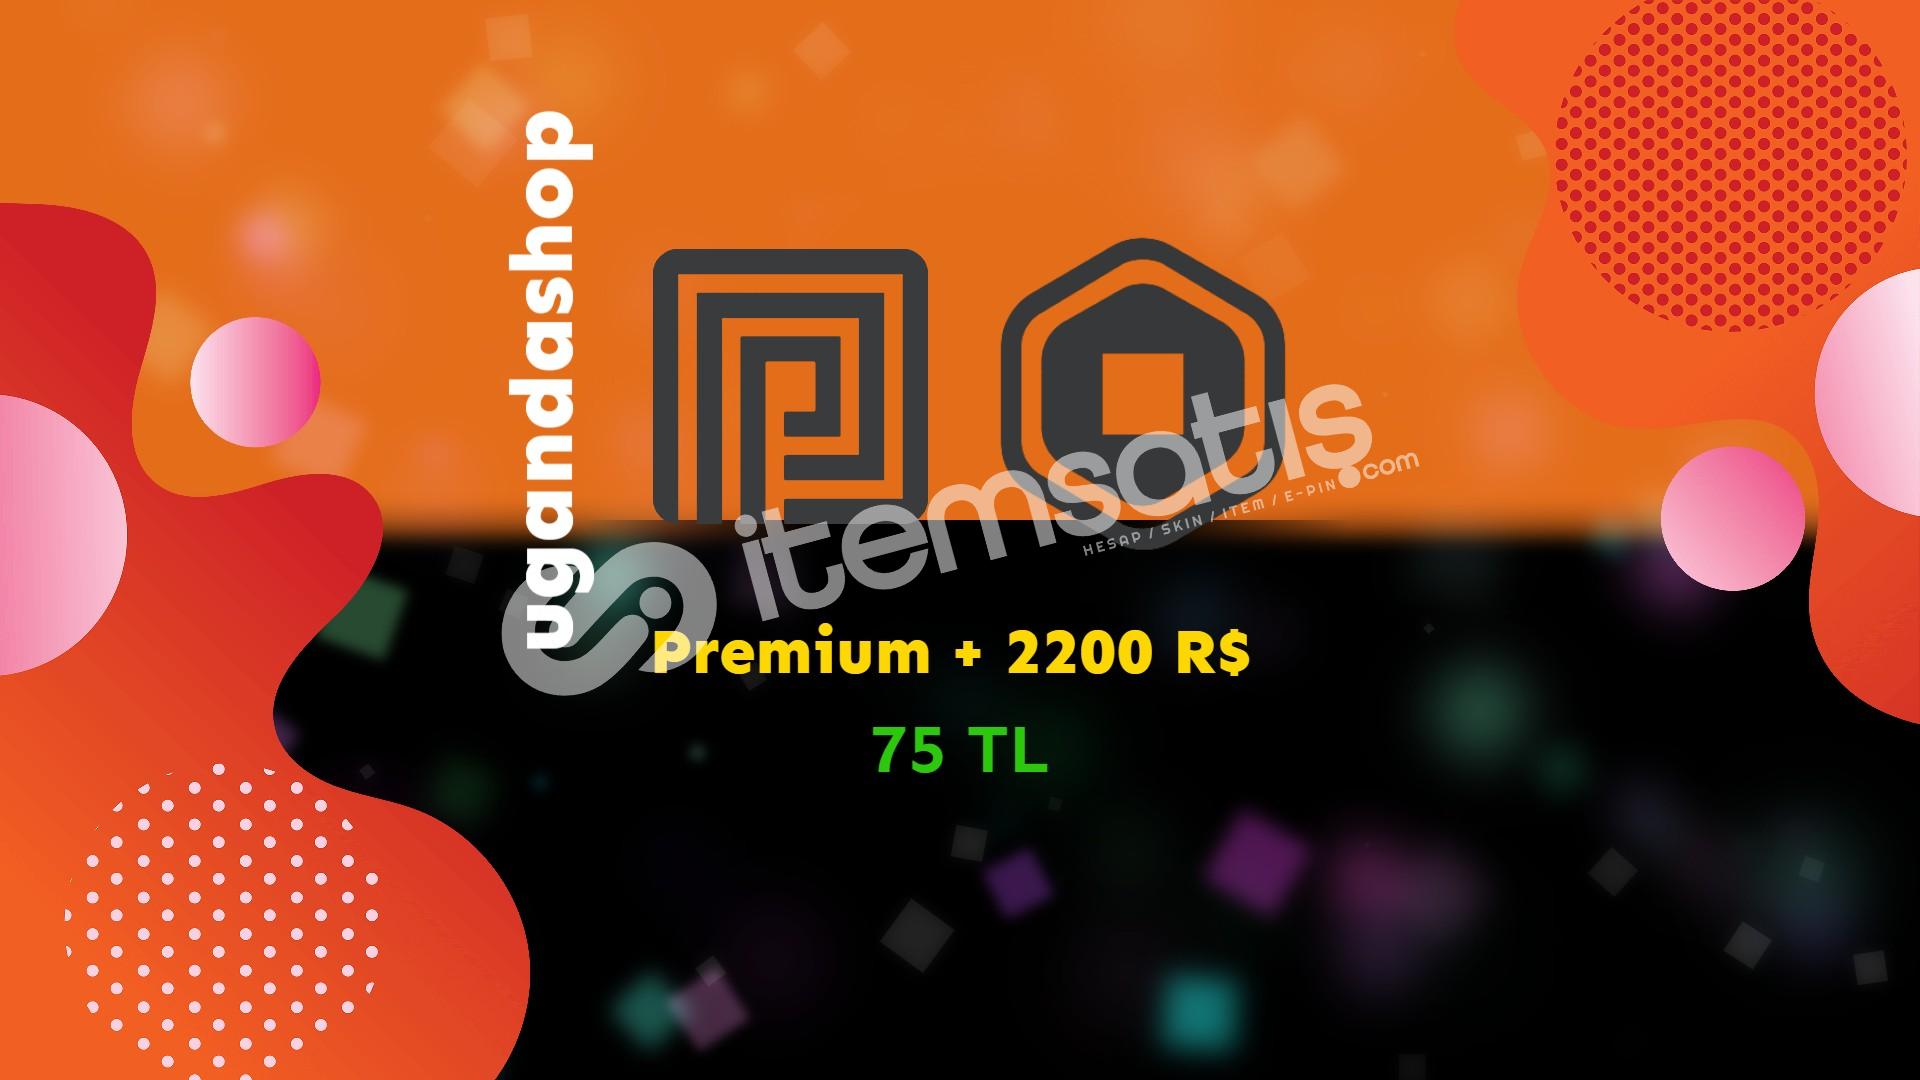 Roblox Premium + 2200 Robux